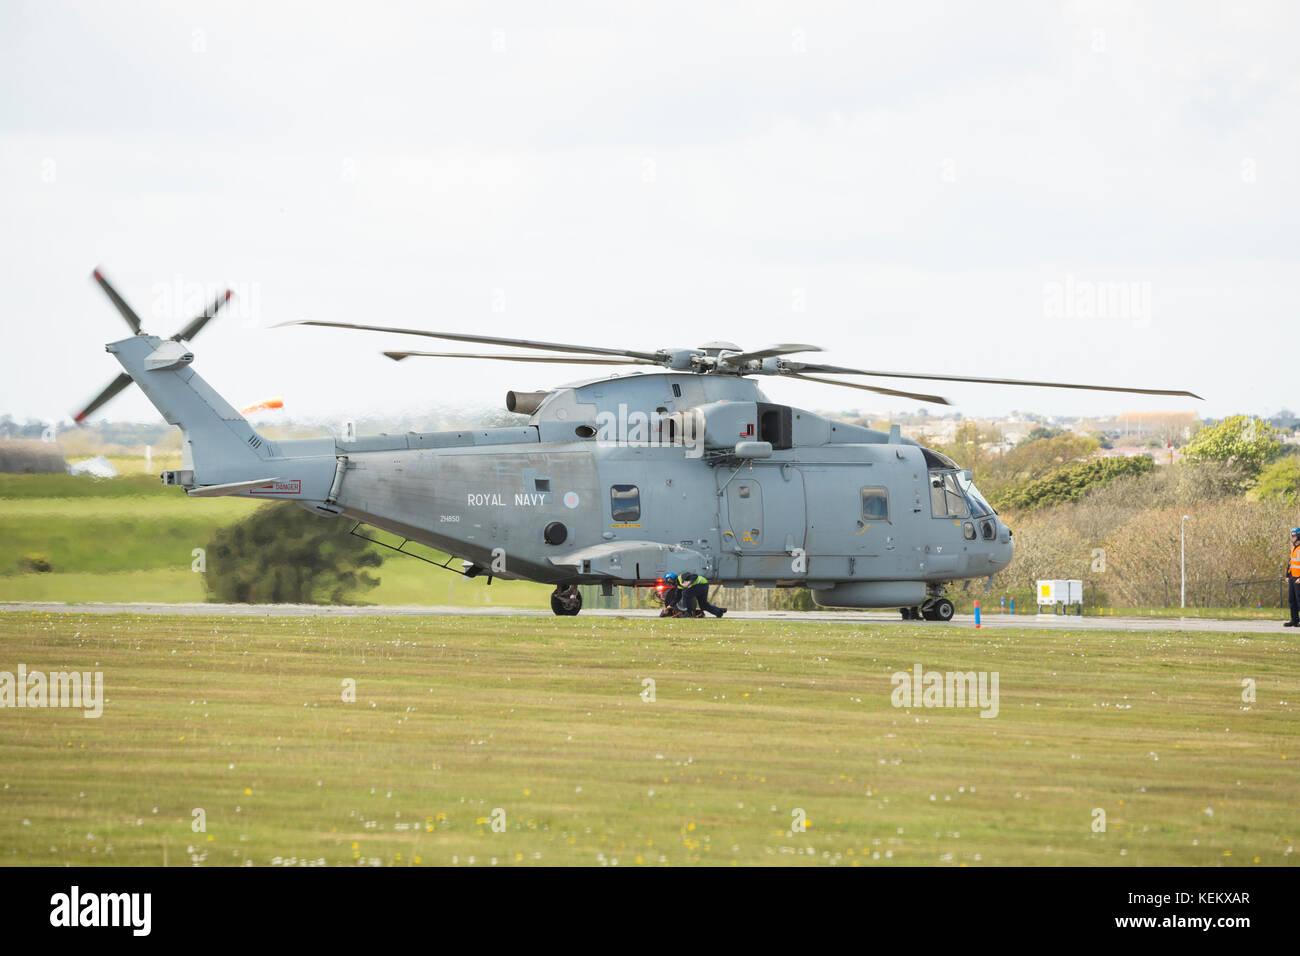 Fleet Air Arm Agusta Westland Merlin HM1 helicopter ground running RNAS Culdrose groung crew man removing chocks - Stock Image